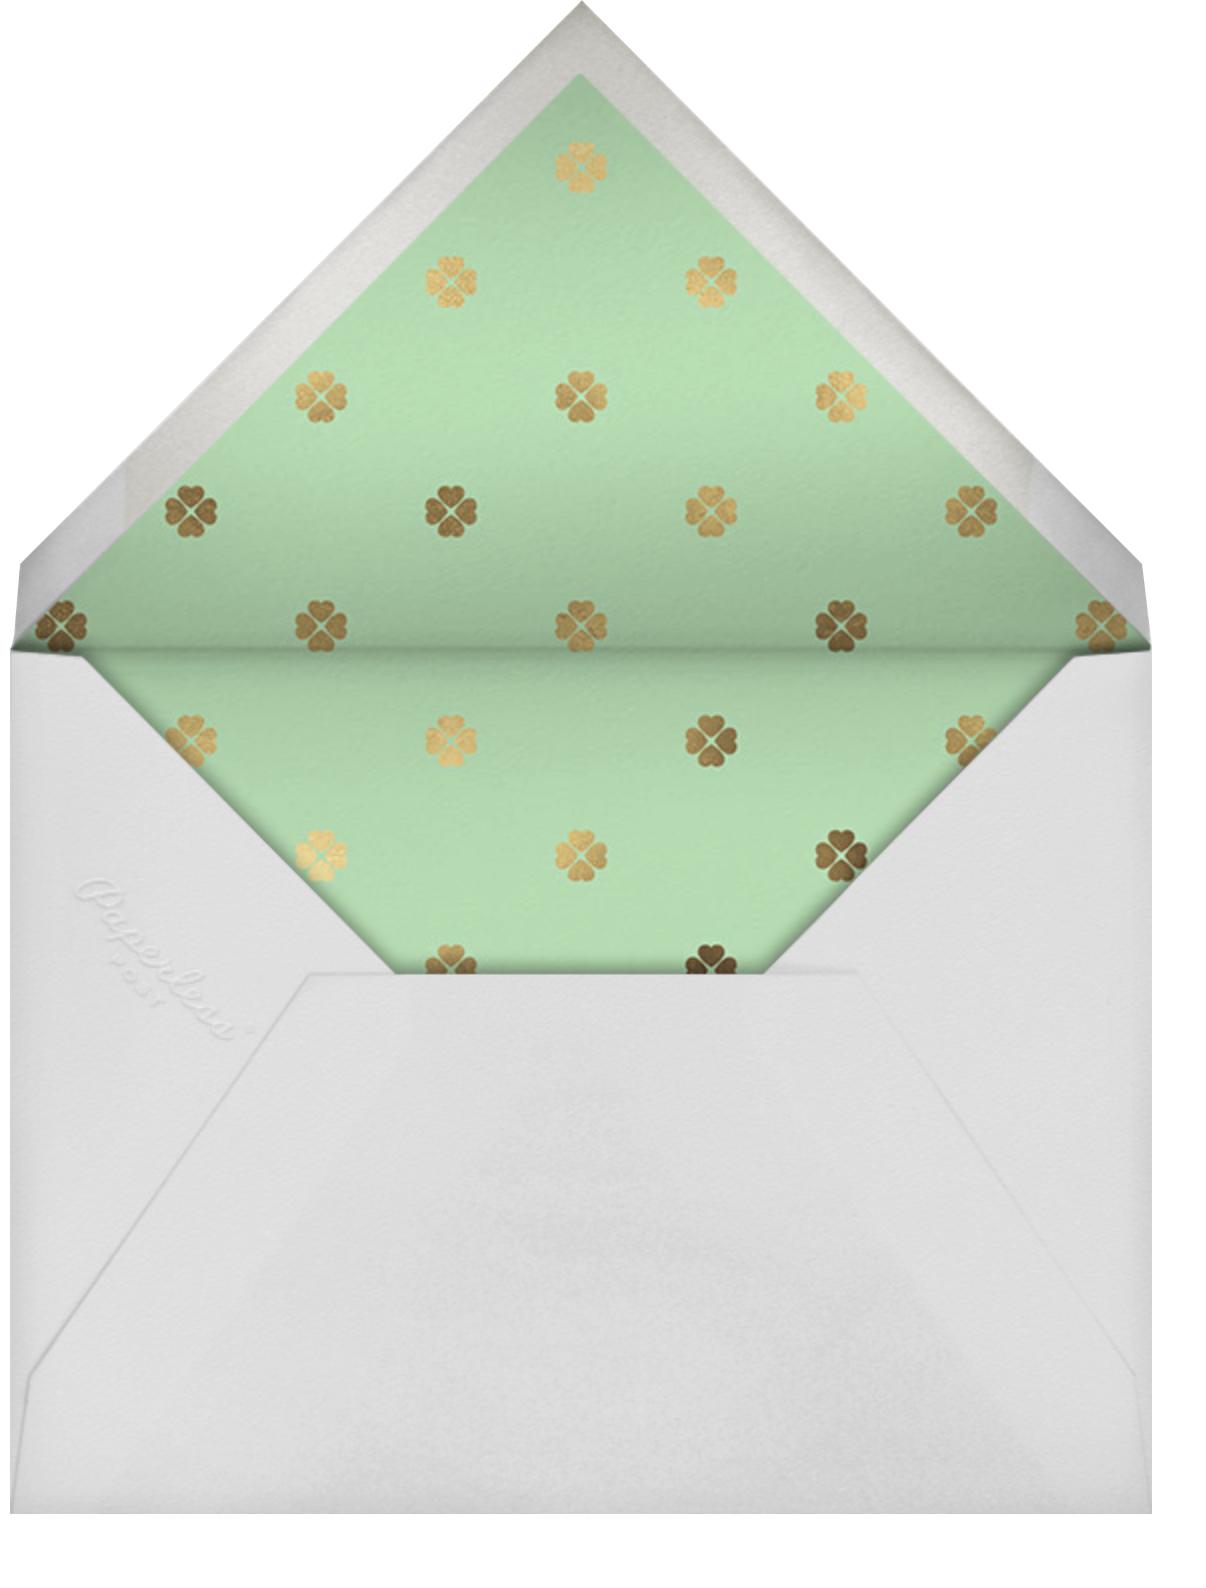 Colorblocked Stripes - Green/Blue - kate spade new york - Baby shower - envelope back